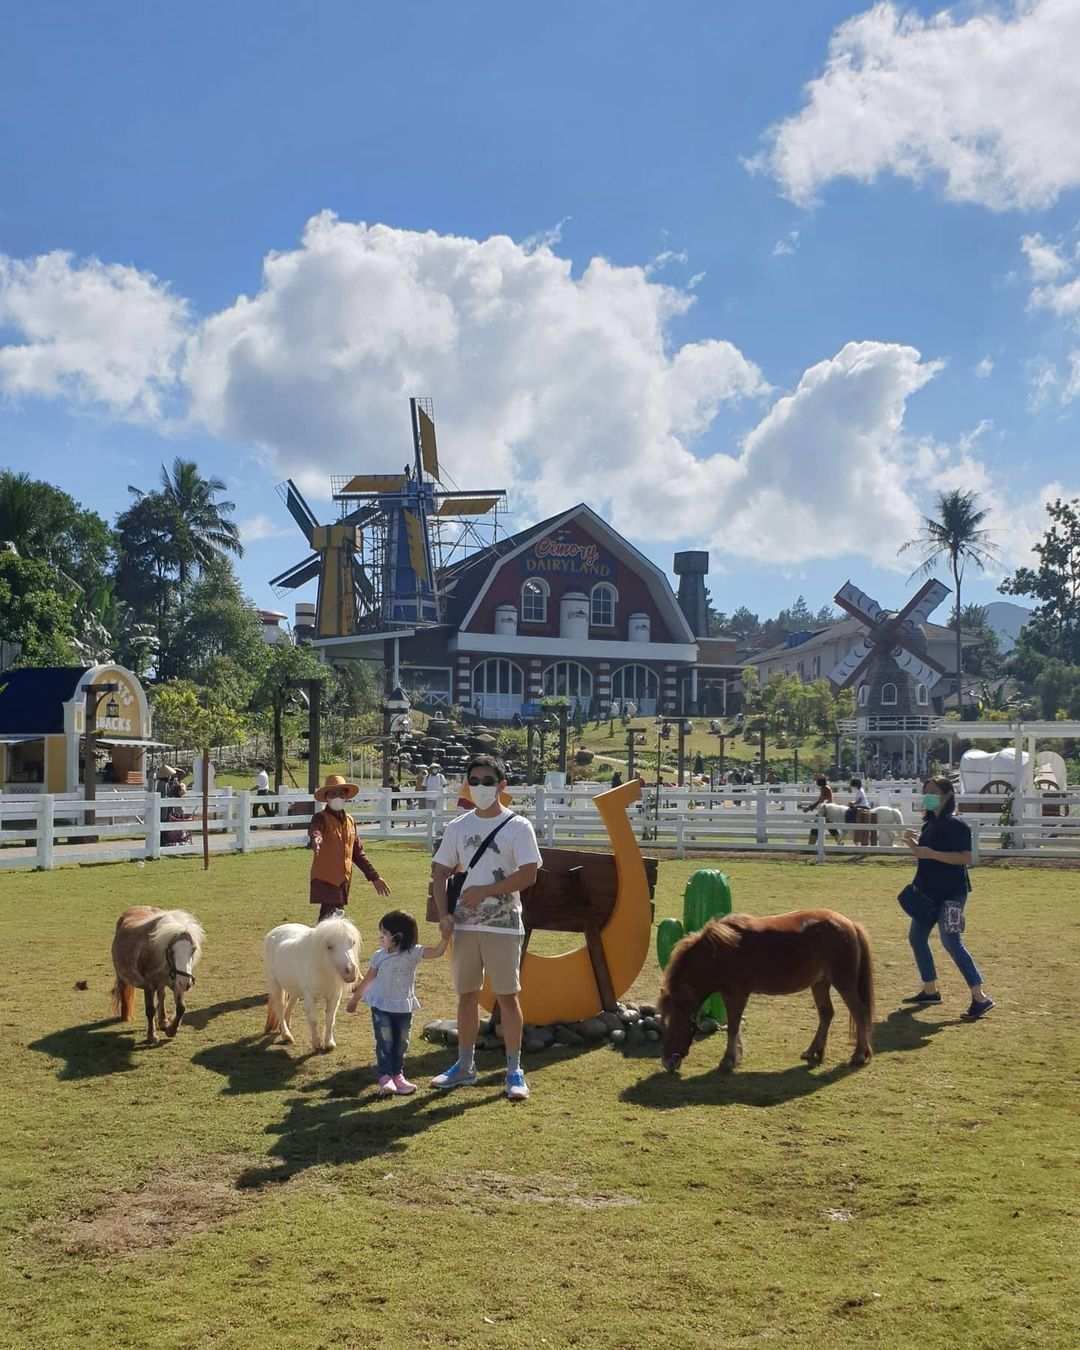 Kuda Pony Di Cimory Dairyland Puncak Bogor Image From @andriselly